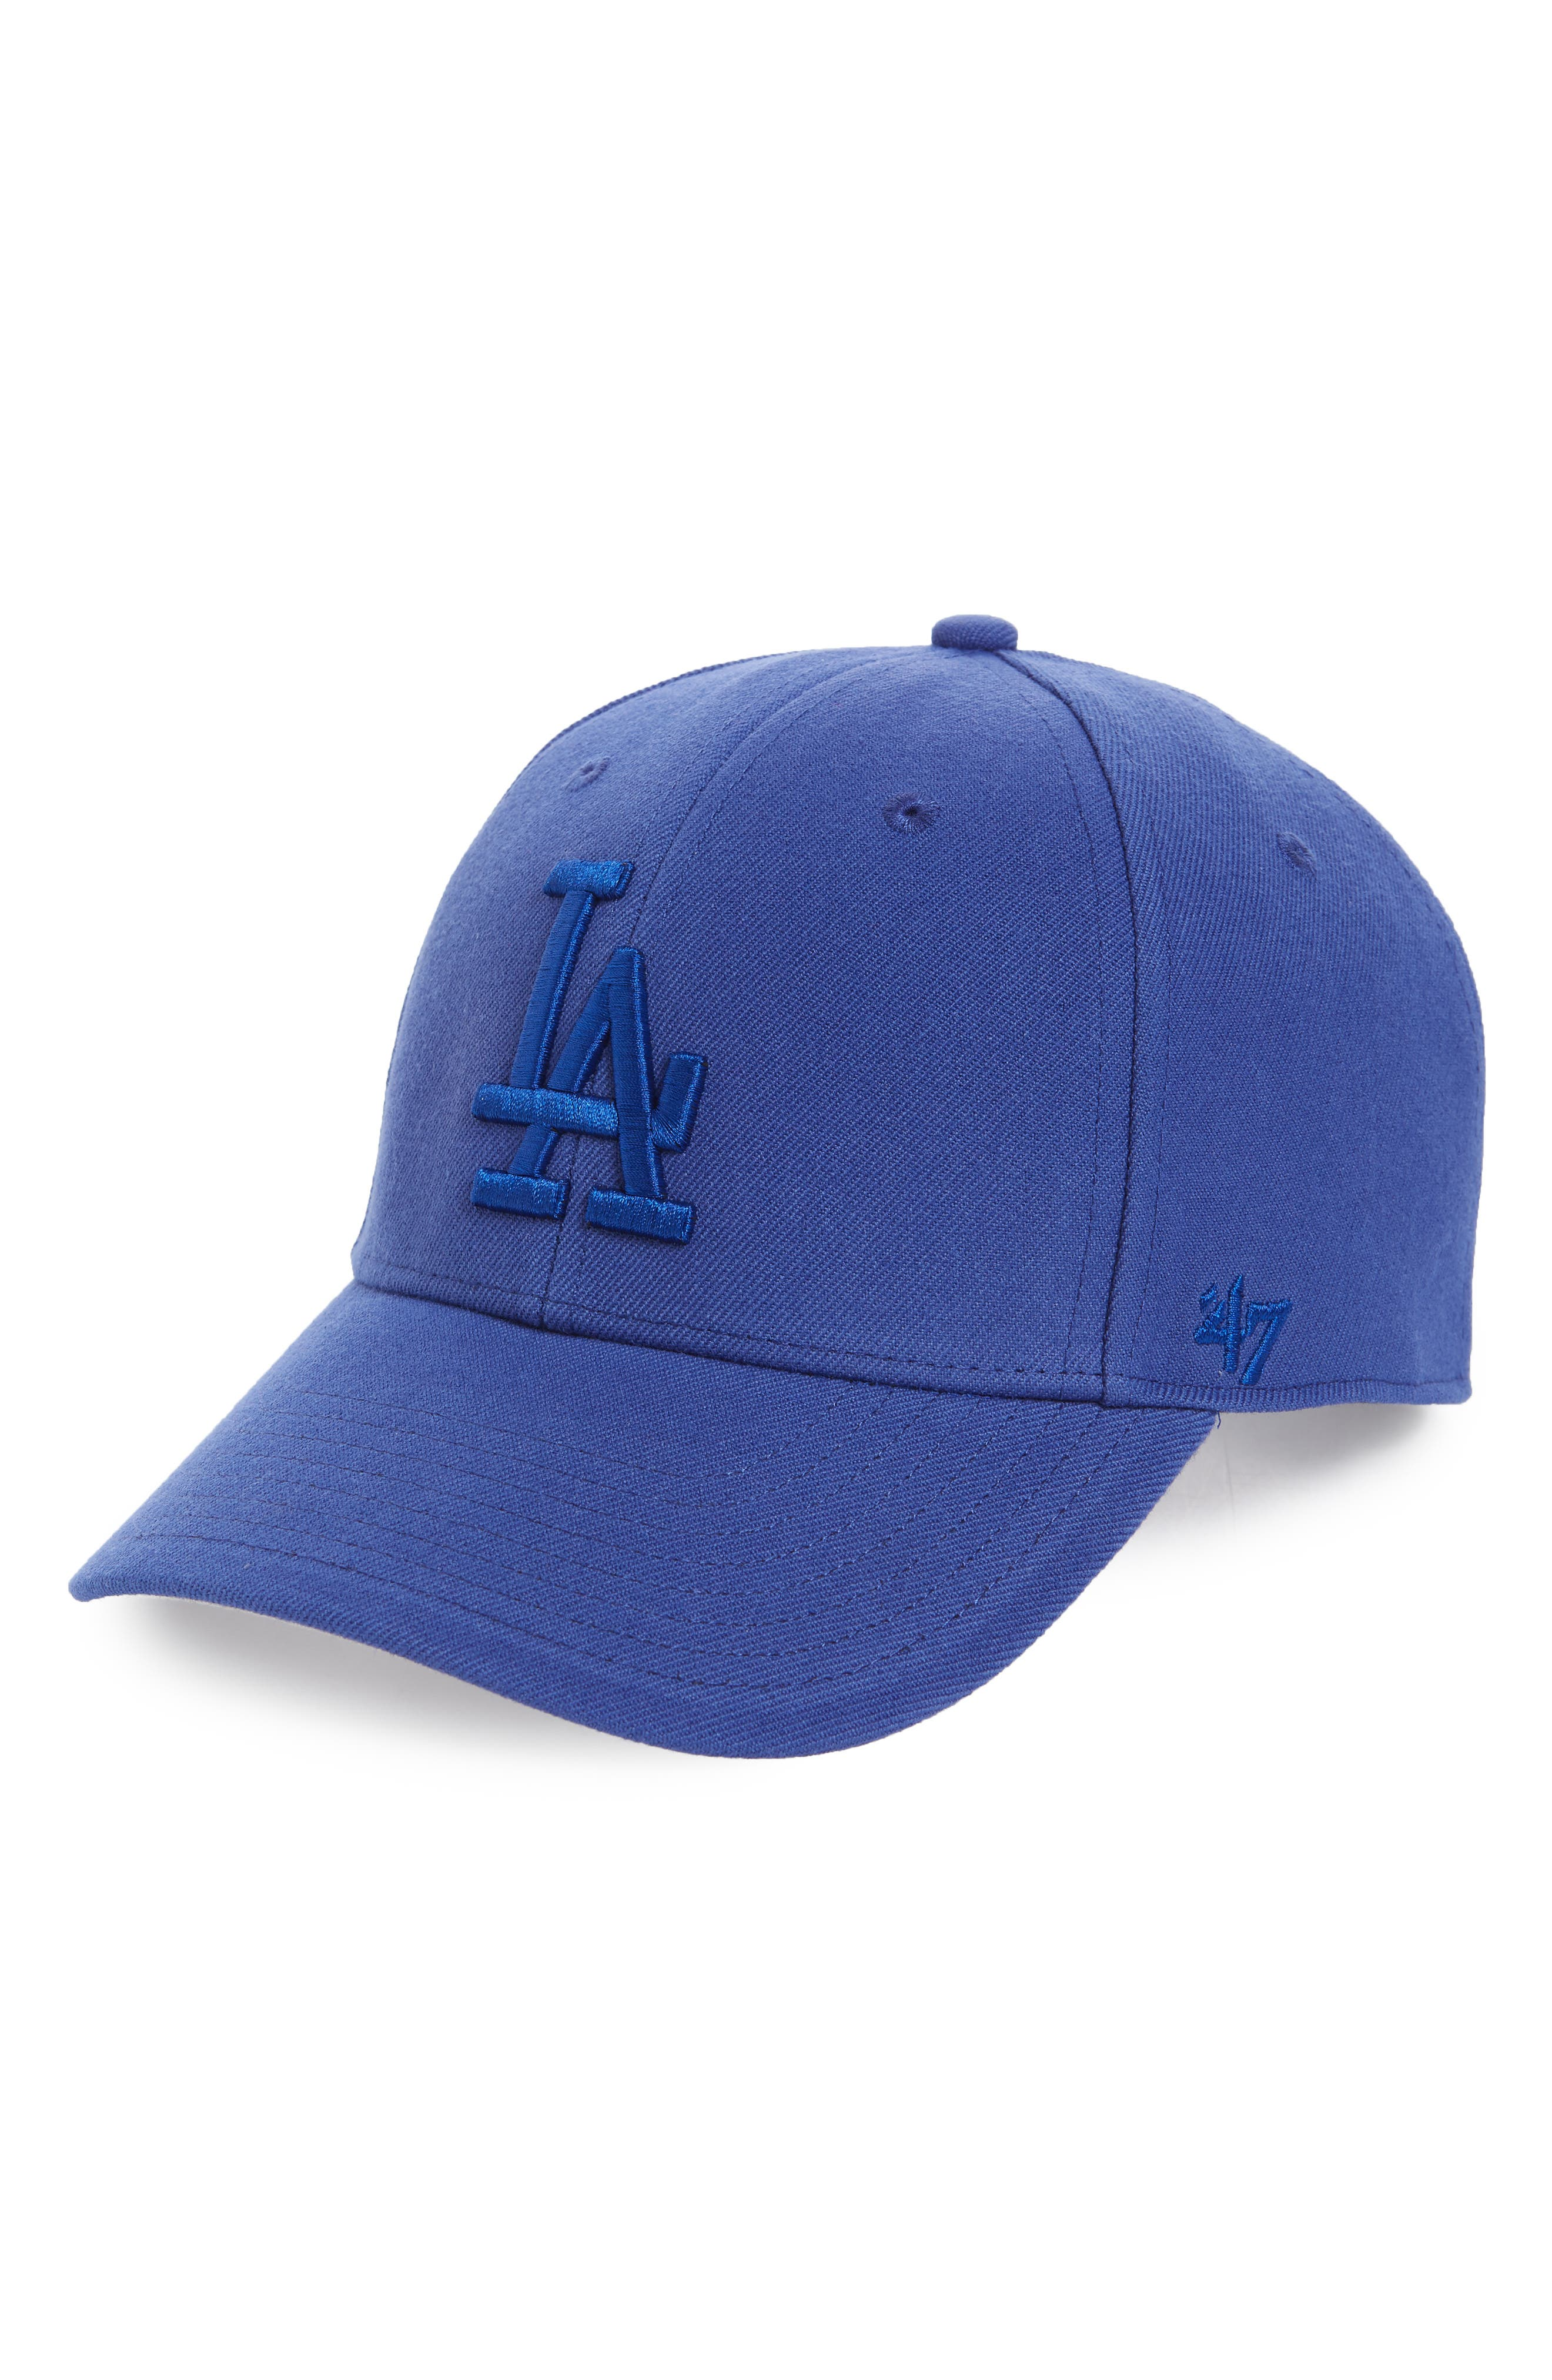 MVP LA Dodgers Baseball Cap,                             Main thumbnail 1, color,                             400